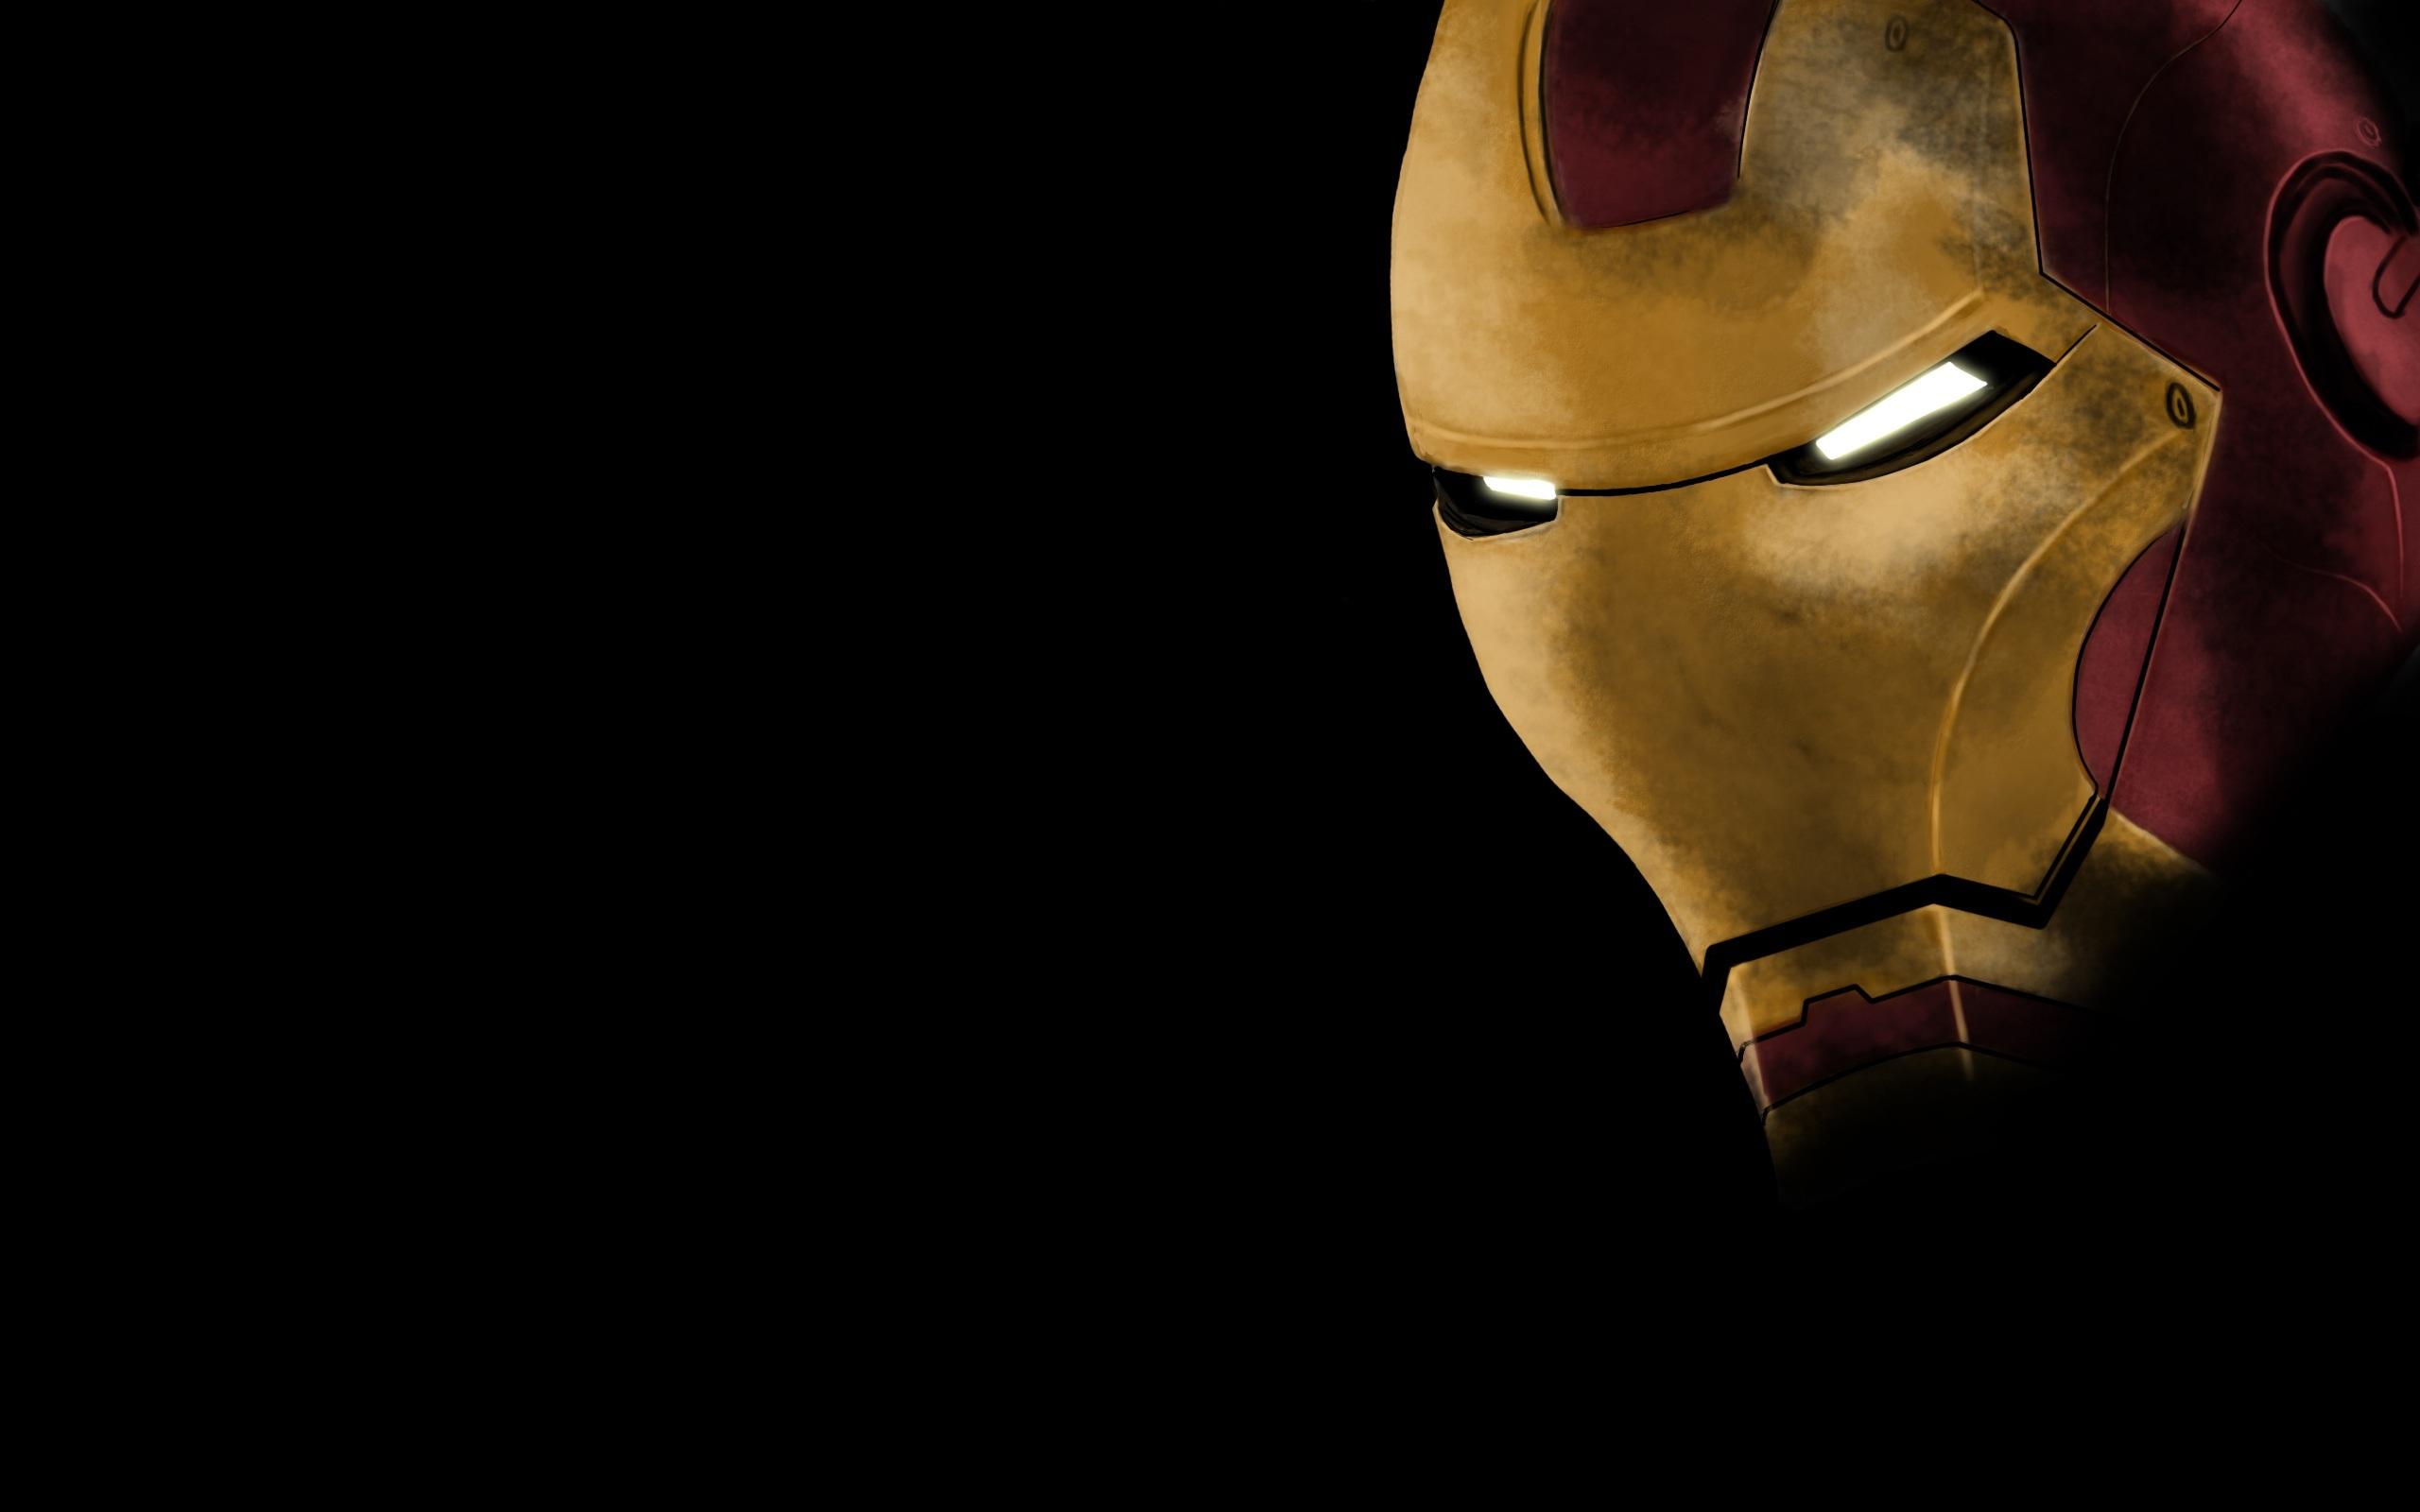 Iron Man Wallpaper 833912 Iron Man Wallpaper 833932 Iron Man 2560x1600